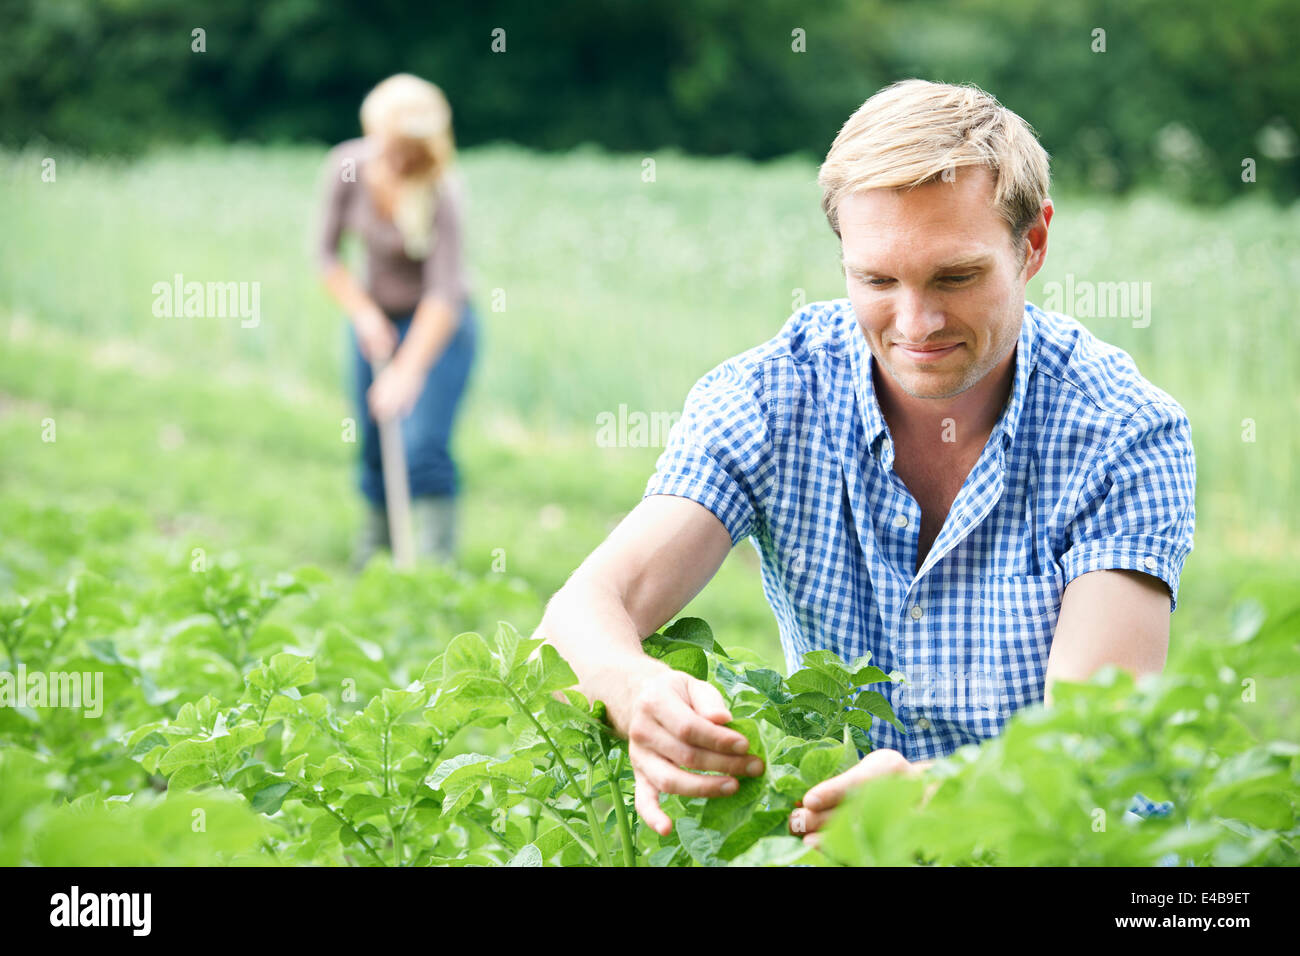 Couple Working In Field On Organic Farm - Stock Image